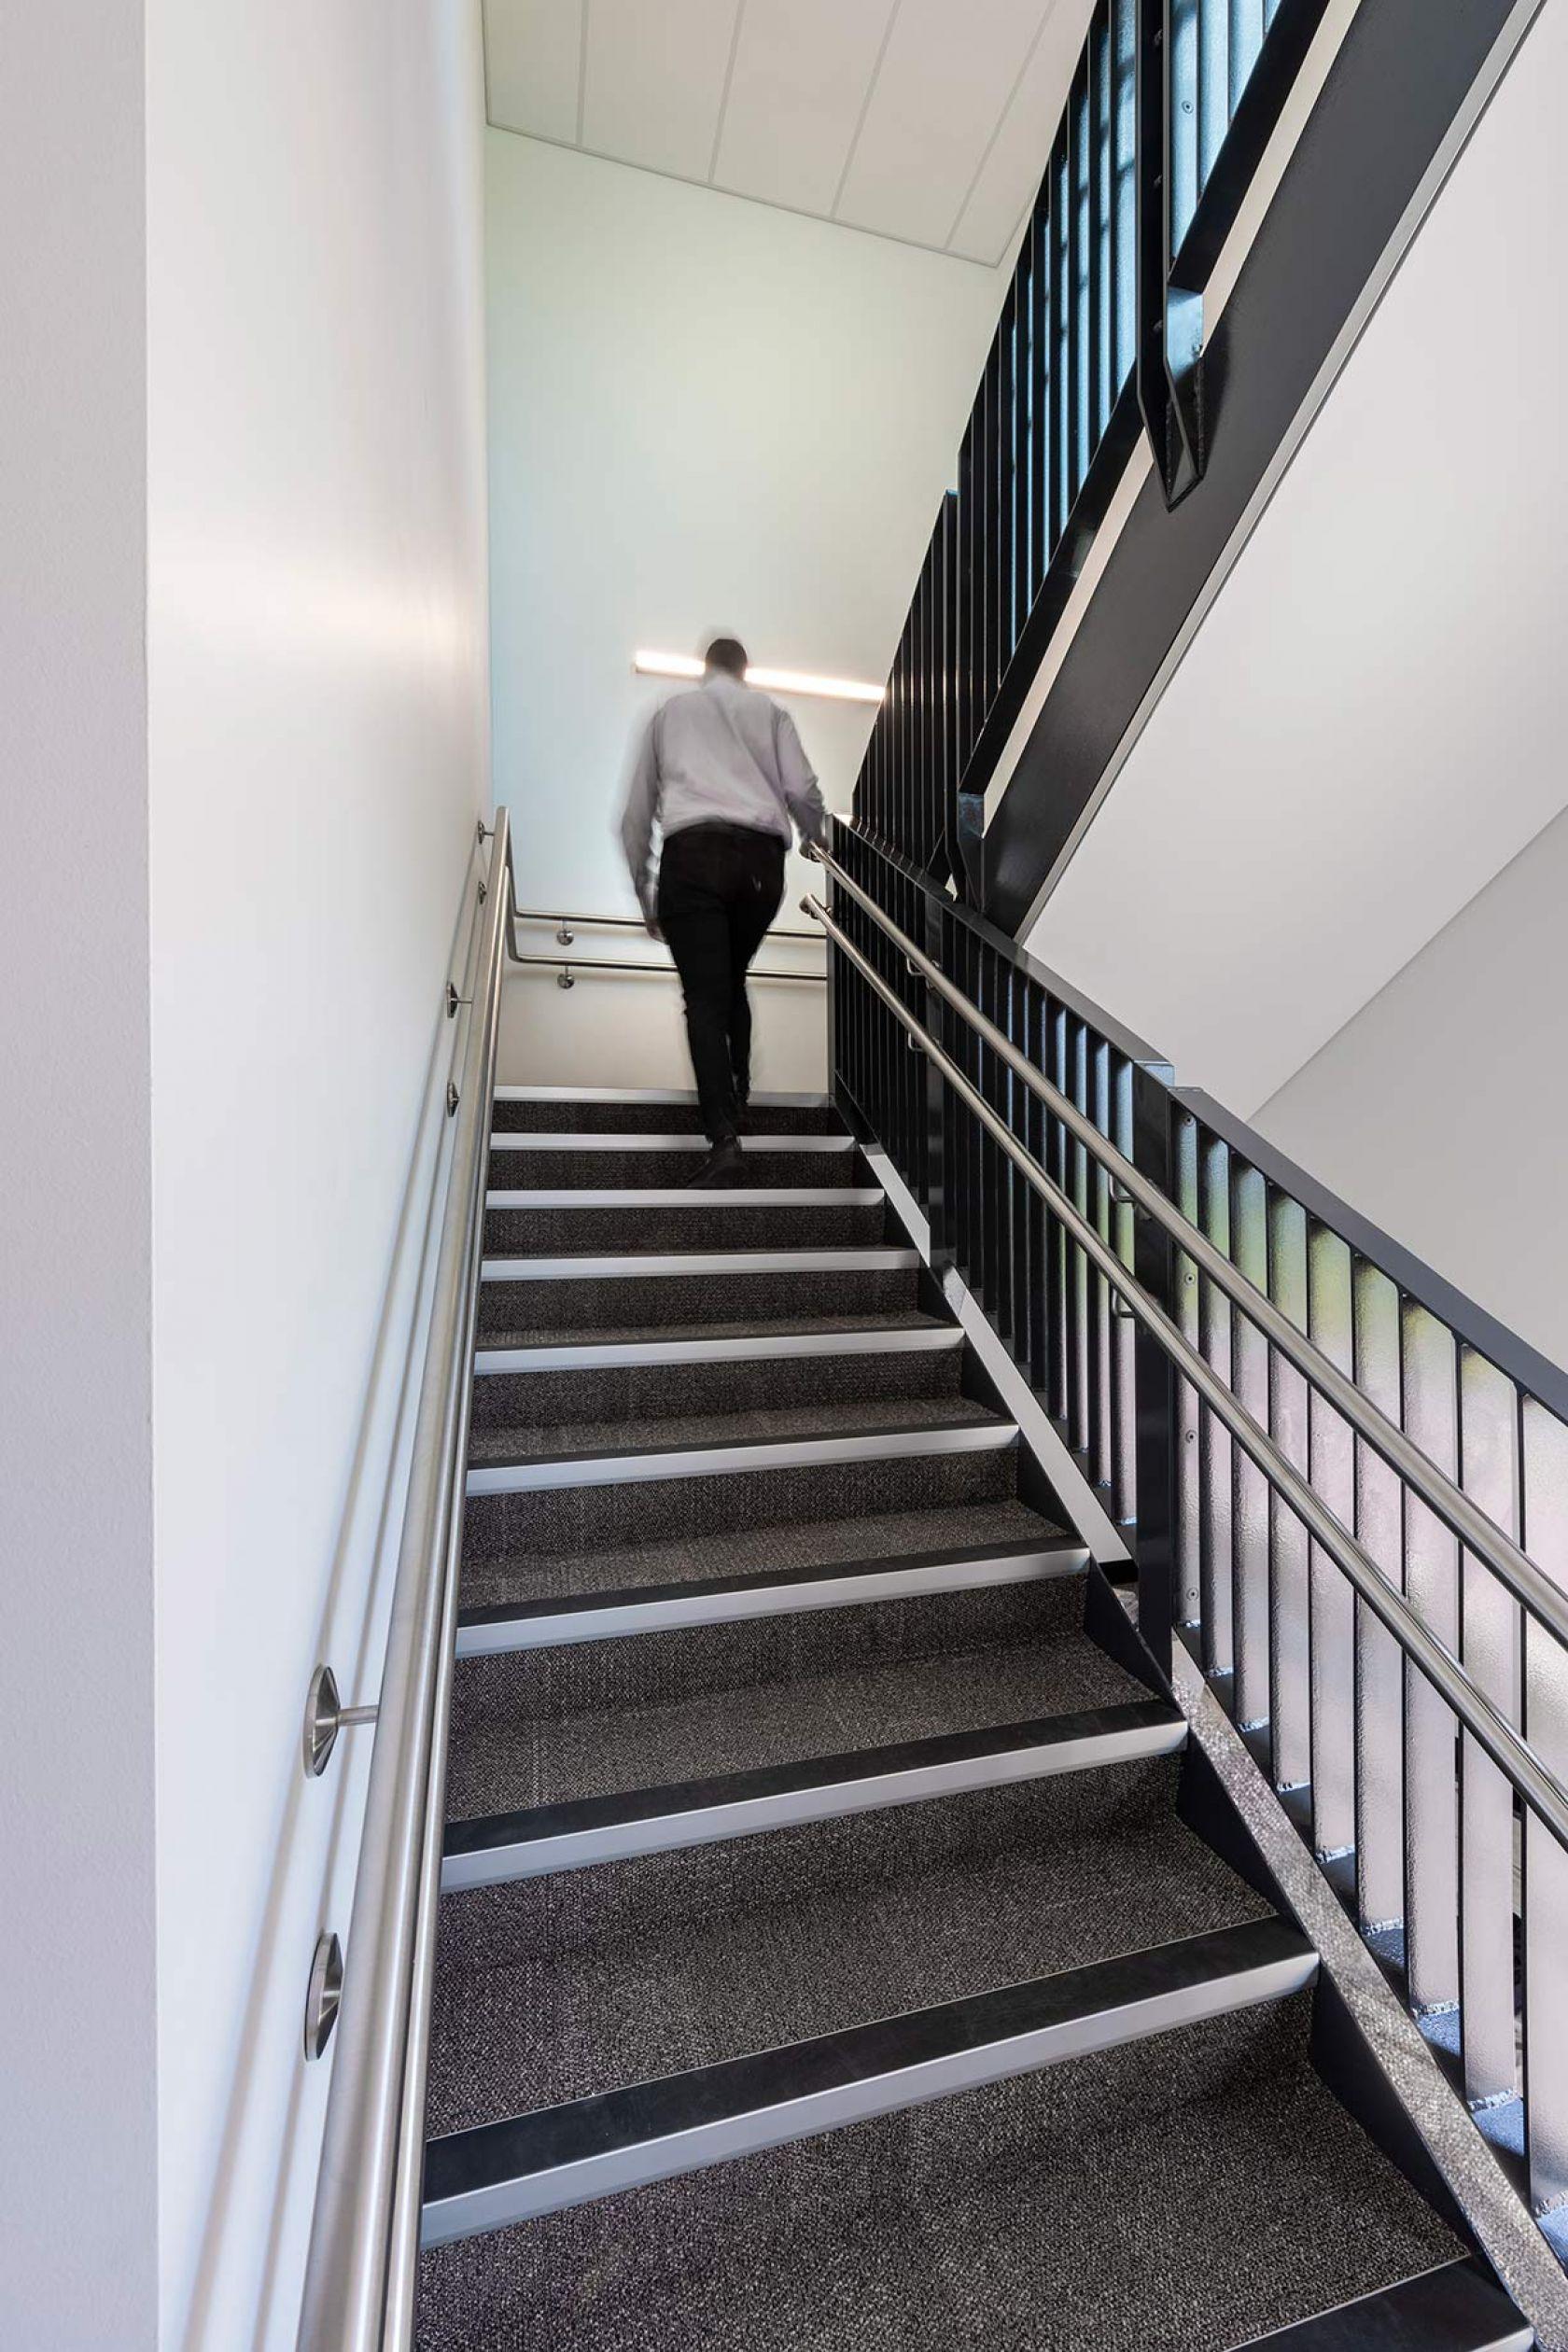 schiavello construction adelaide goodwood oval sport stadium stairs